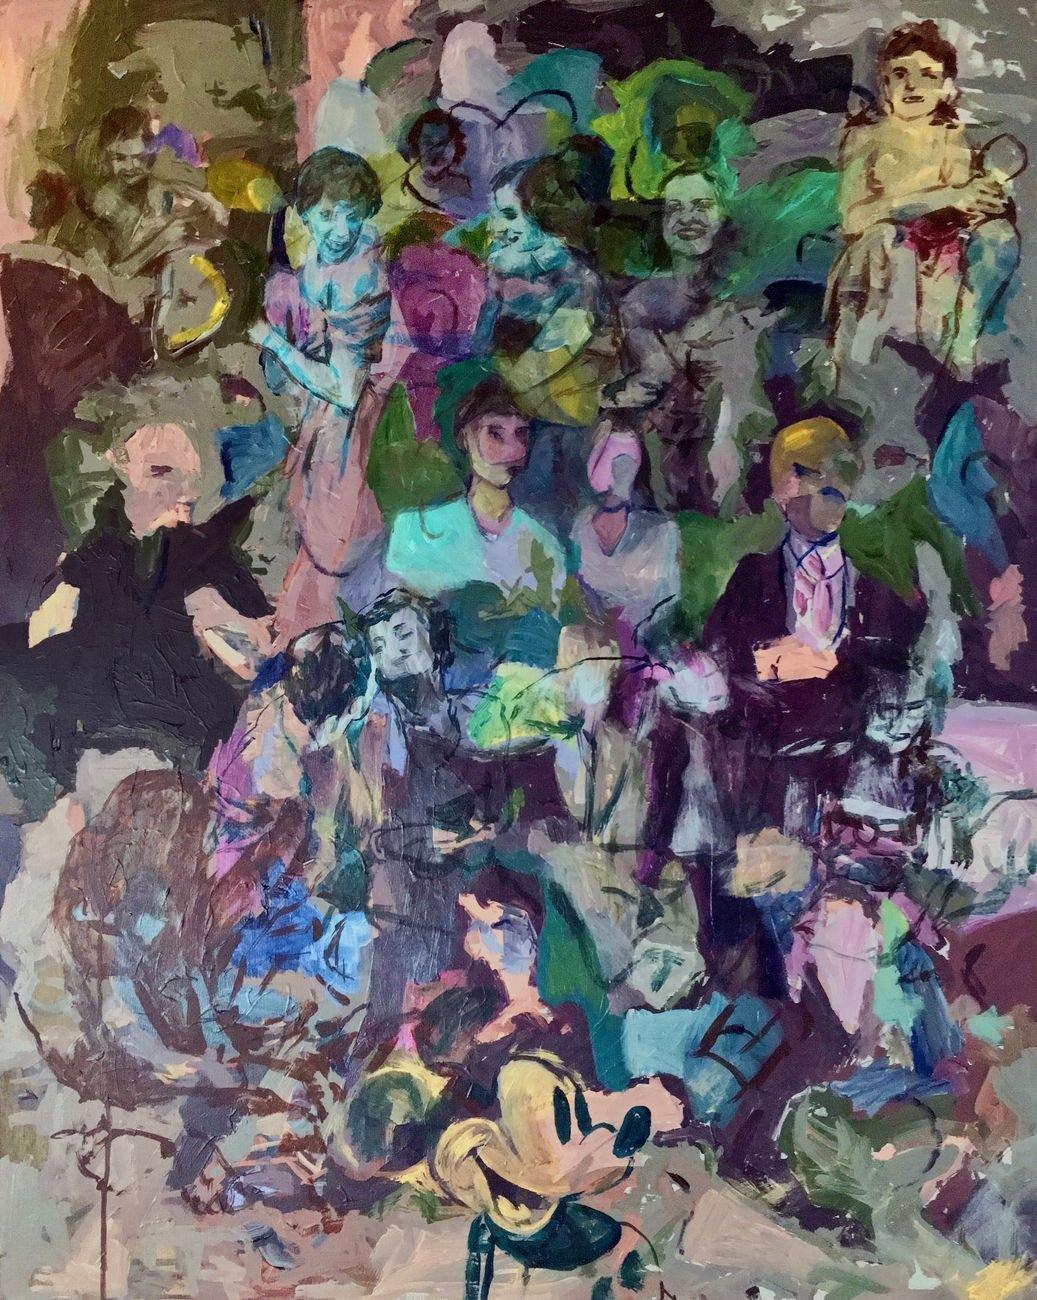 Gianluca Capozzi, Untitled, 2018, acrilic on canvas, 100x80 cm